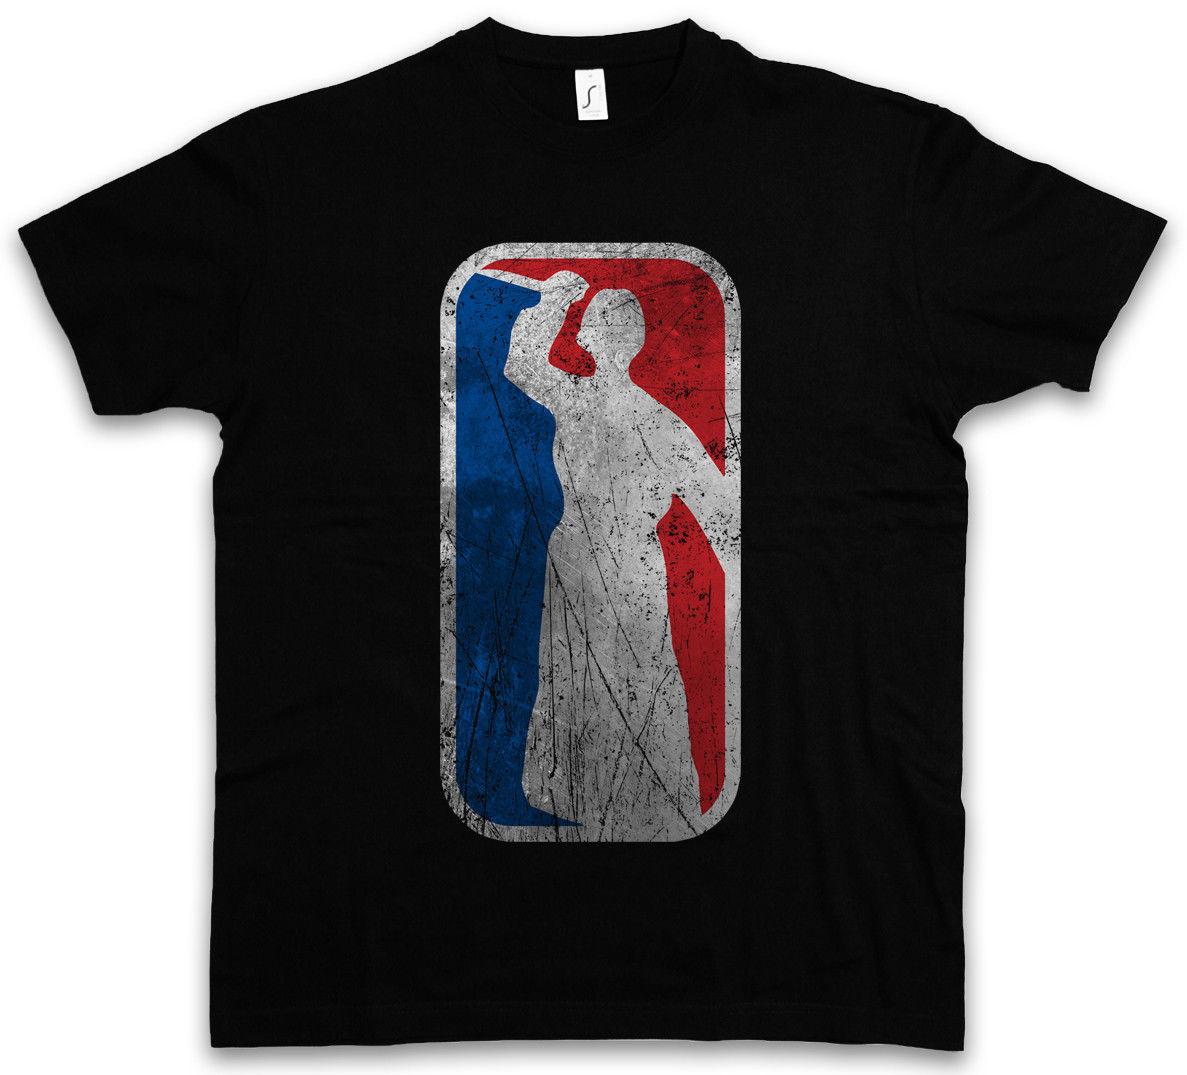 Psycho League T Shirt Michael Halloween Horror Fun Shirt Major League Myers